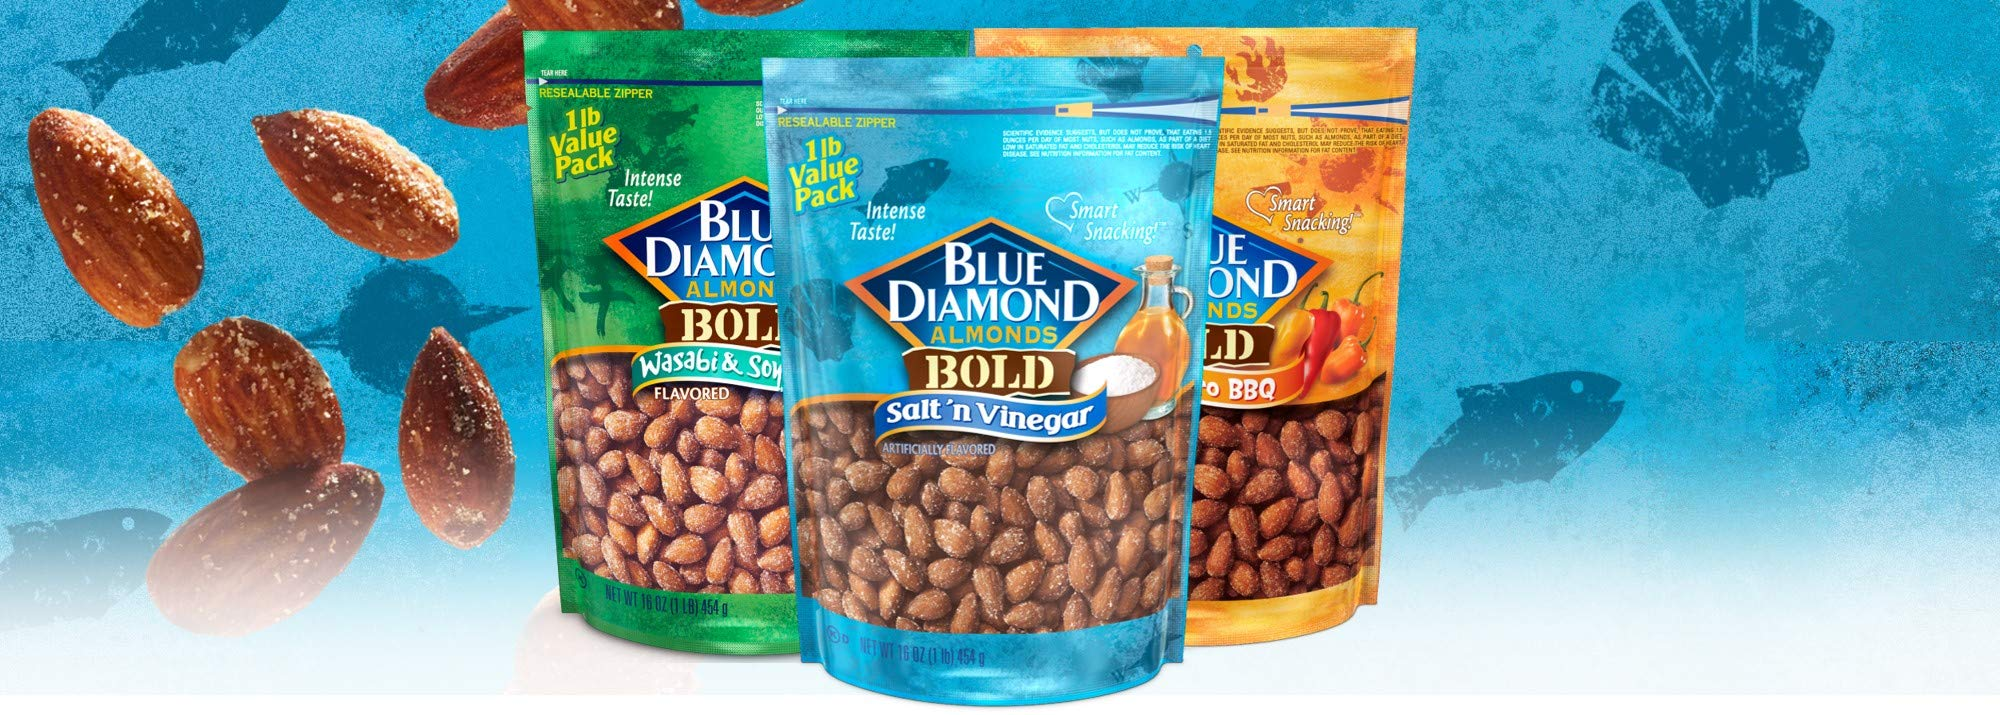 Blue Diamond Almonds BOLD Favorites Variety Pack - Salt 'n Vinegar, Habanero BBQ, & Wasabi & Soy Sauce, 16 Ounce BOLD Variety Pack (Pack of 3) by Blue Diamond Almonds (Image #2)